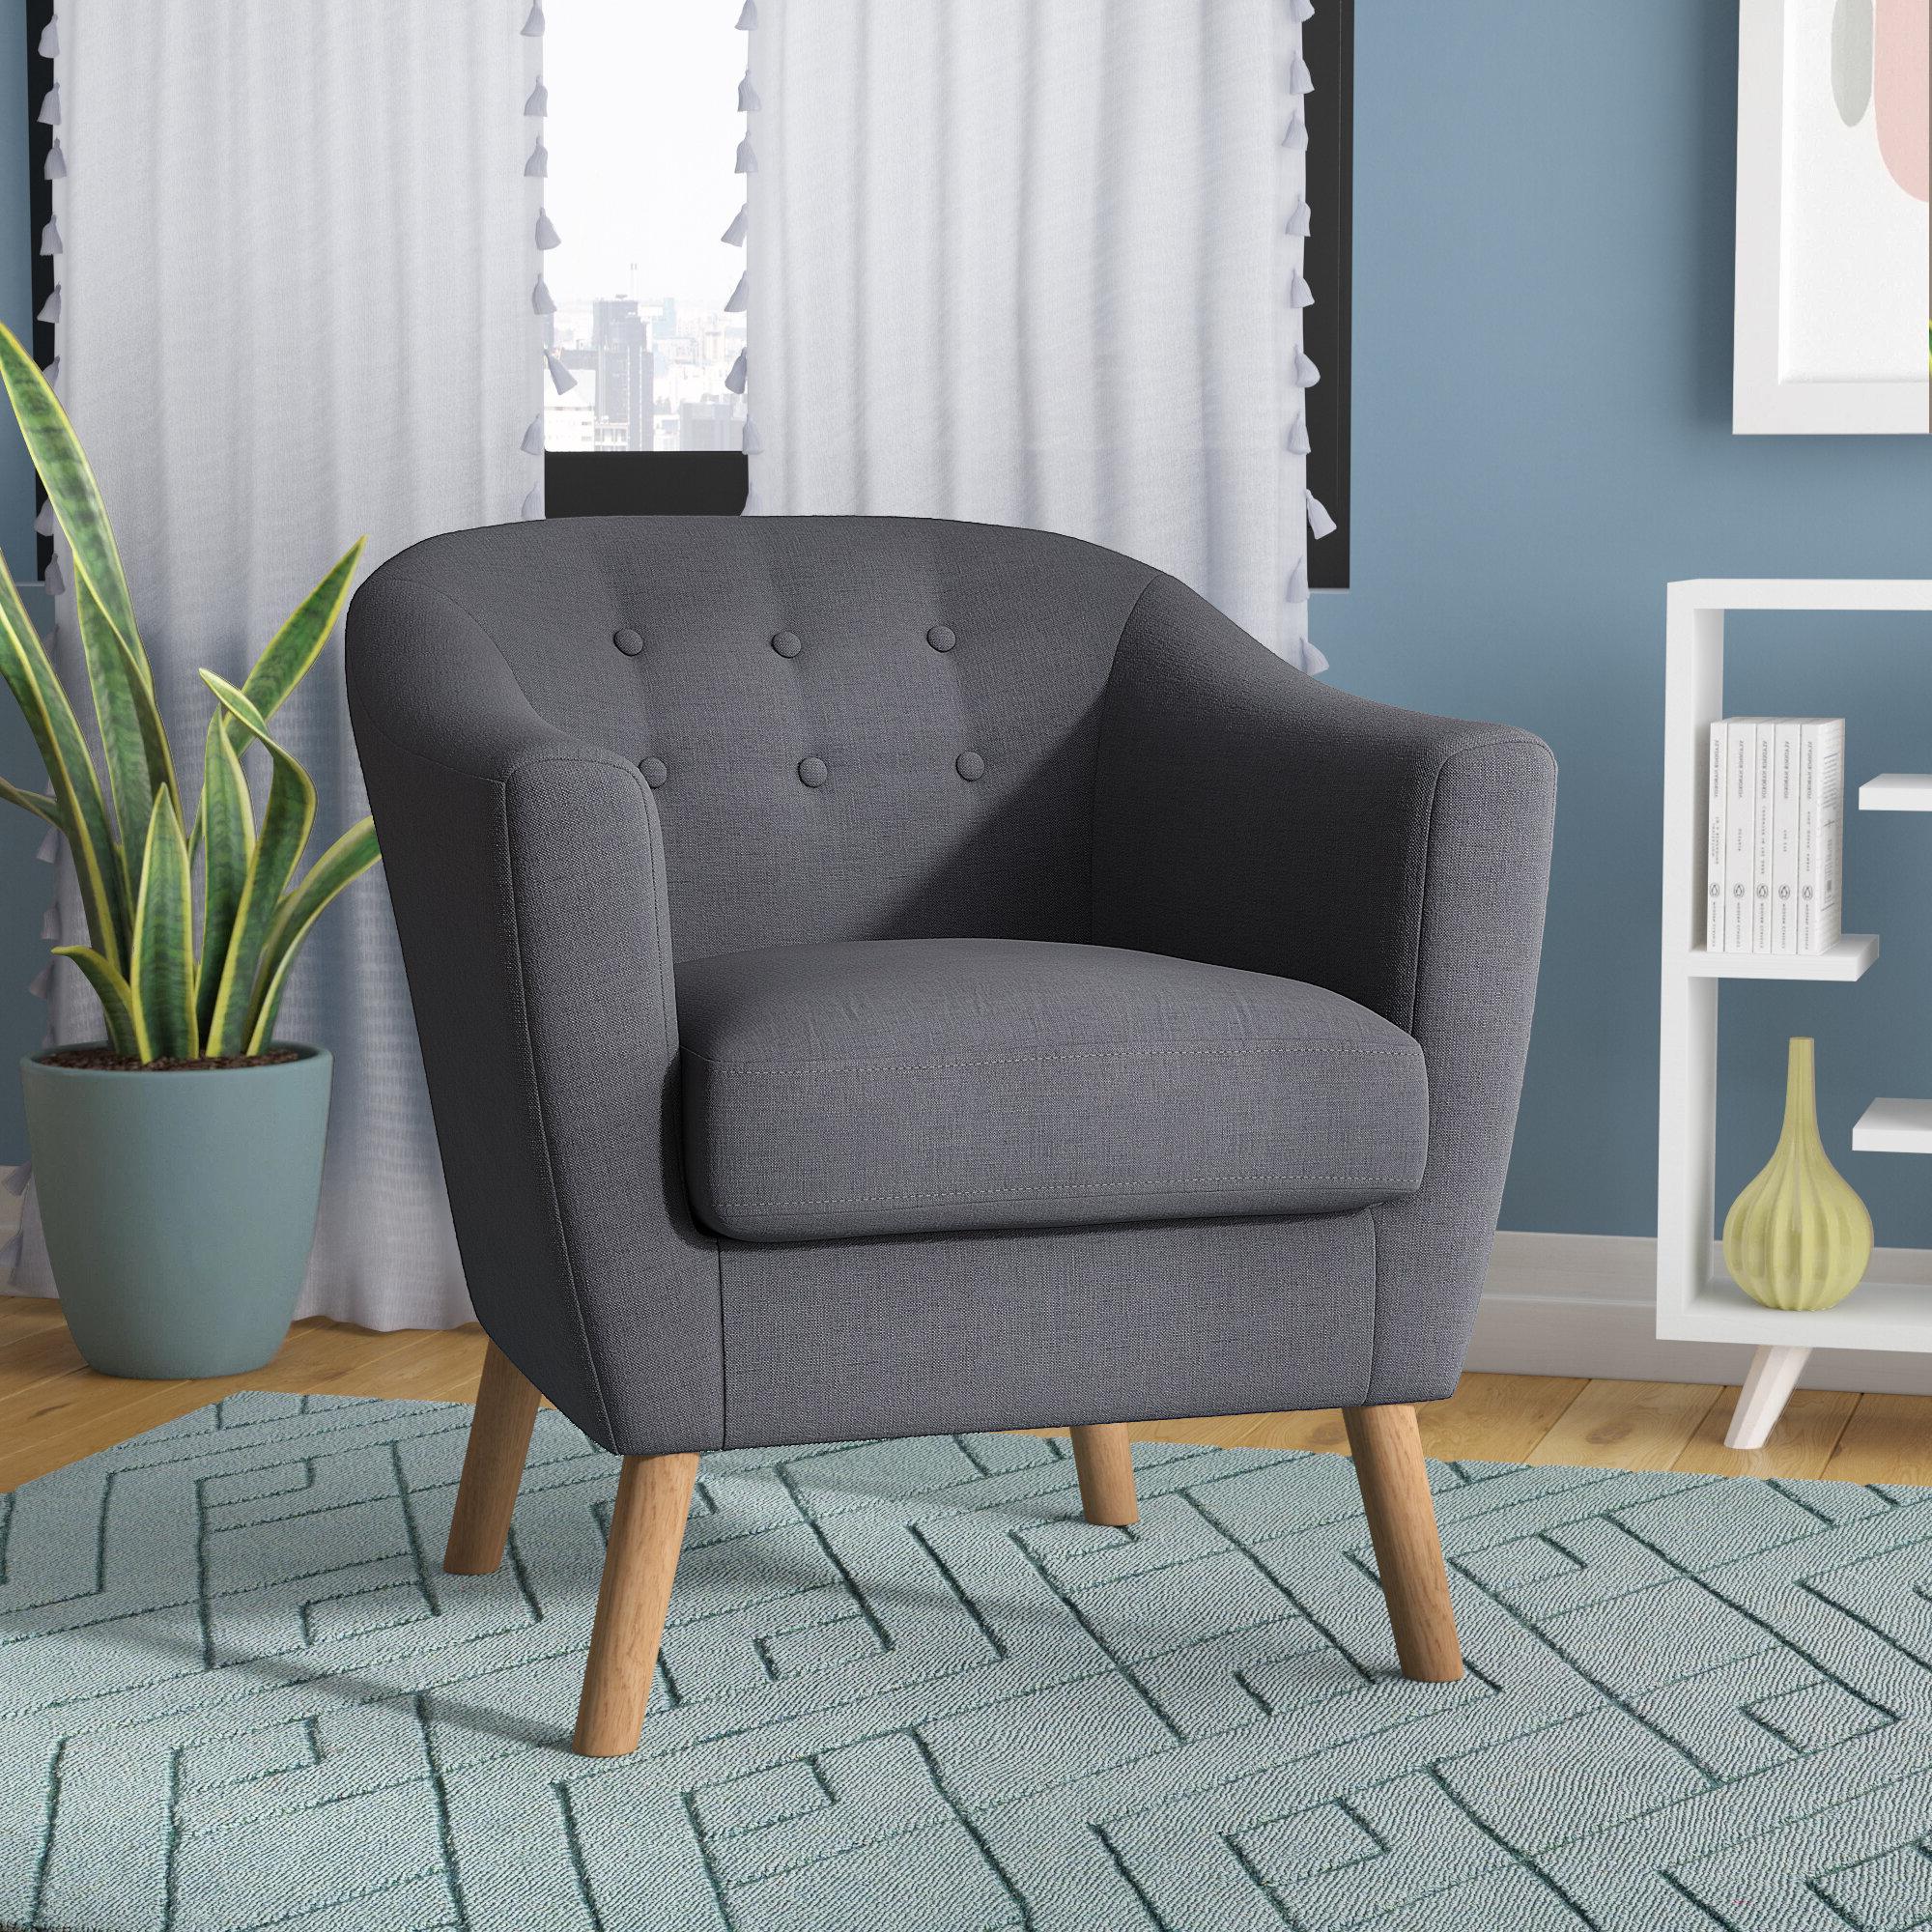 Wayfair Inside Blaithin Simple Single Barrel Chairs (View 9 of 20)